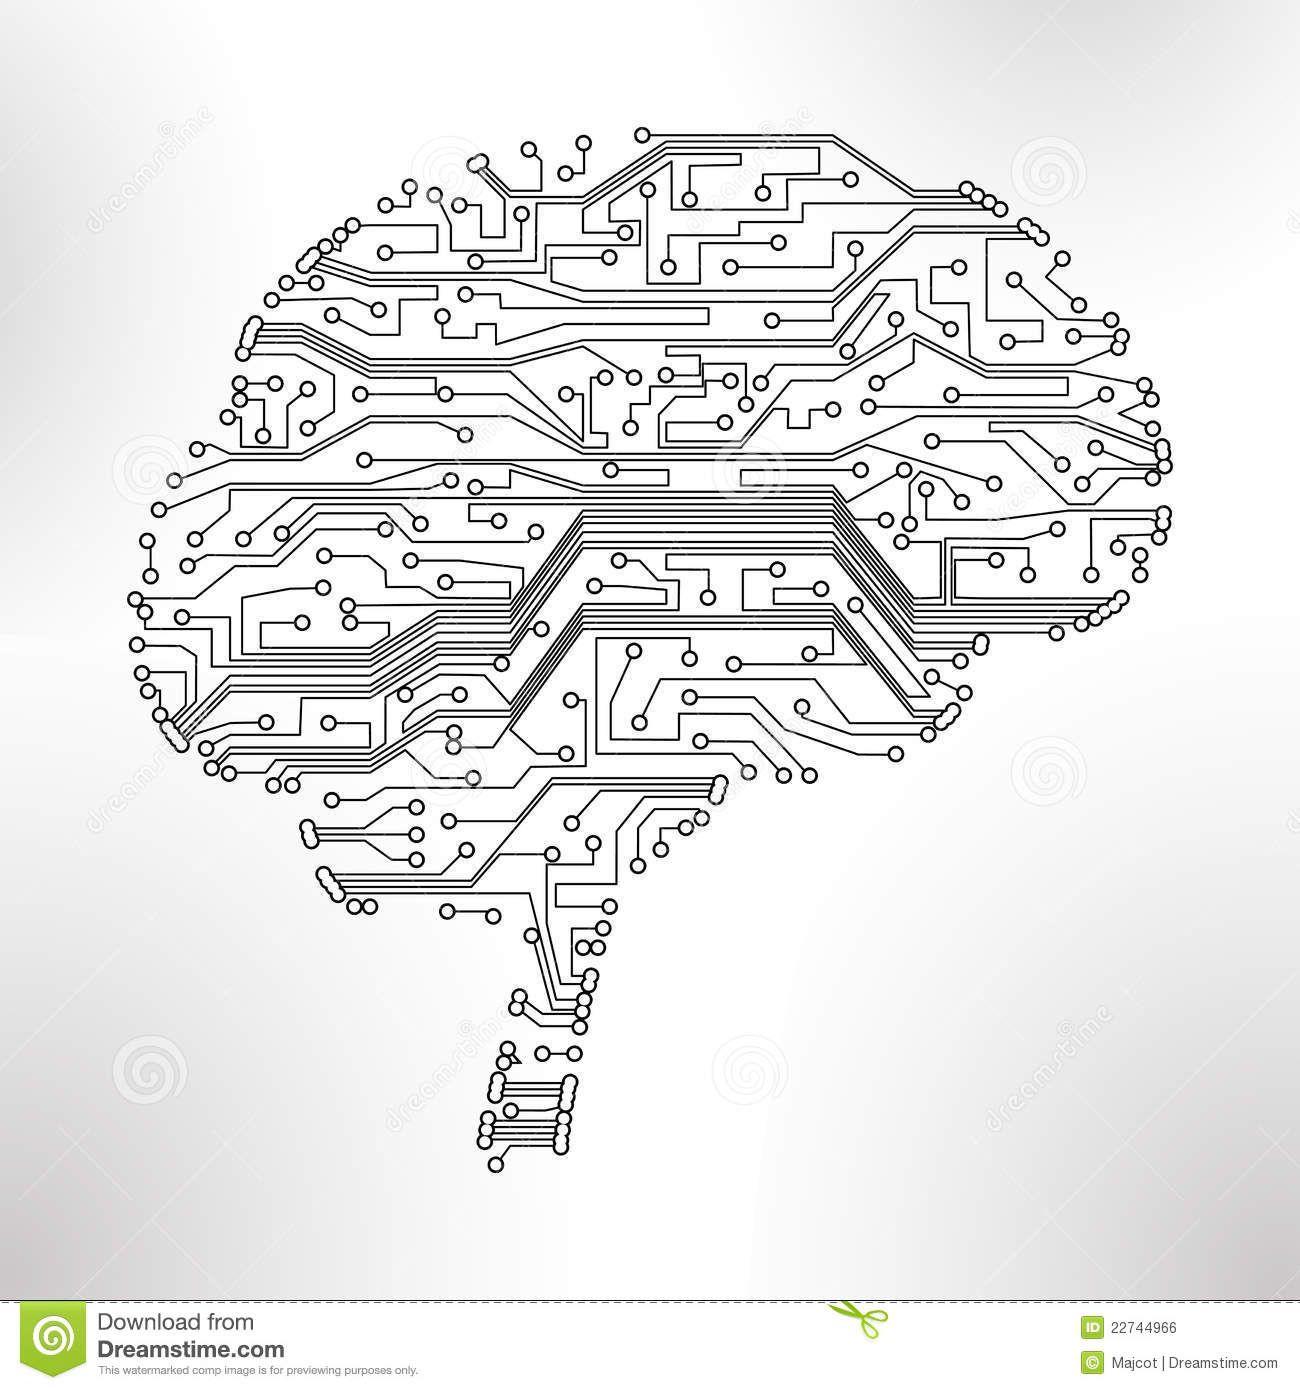 Circuit board | ISI - Logo | Pinterest | Circuits